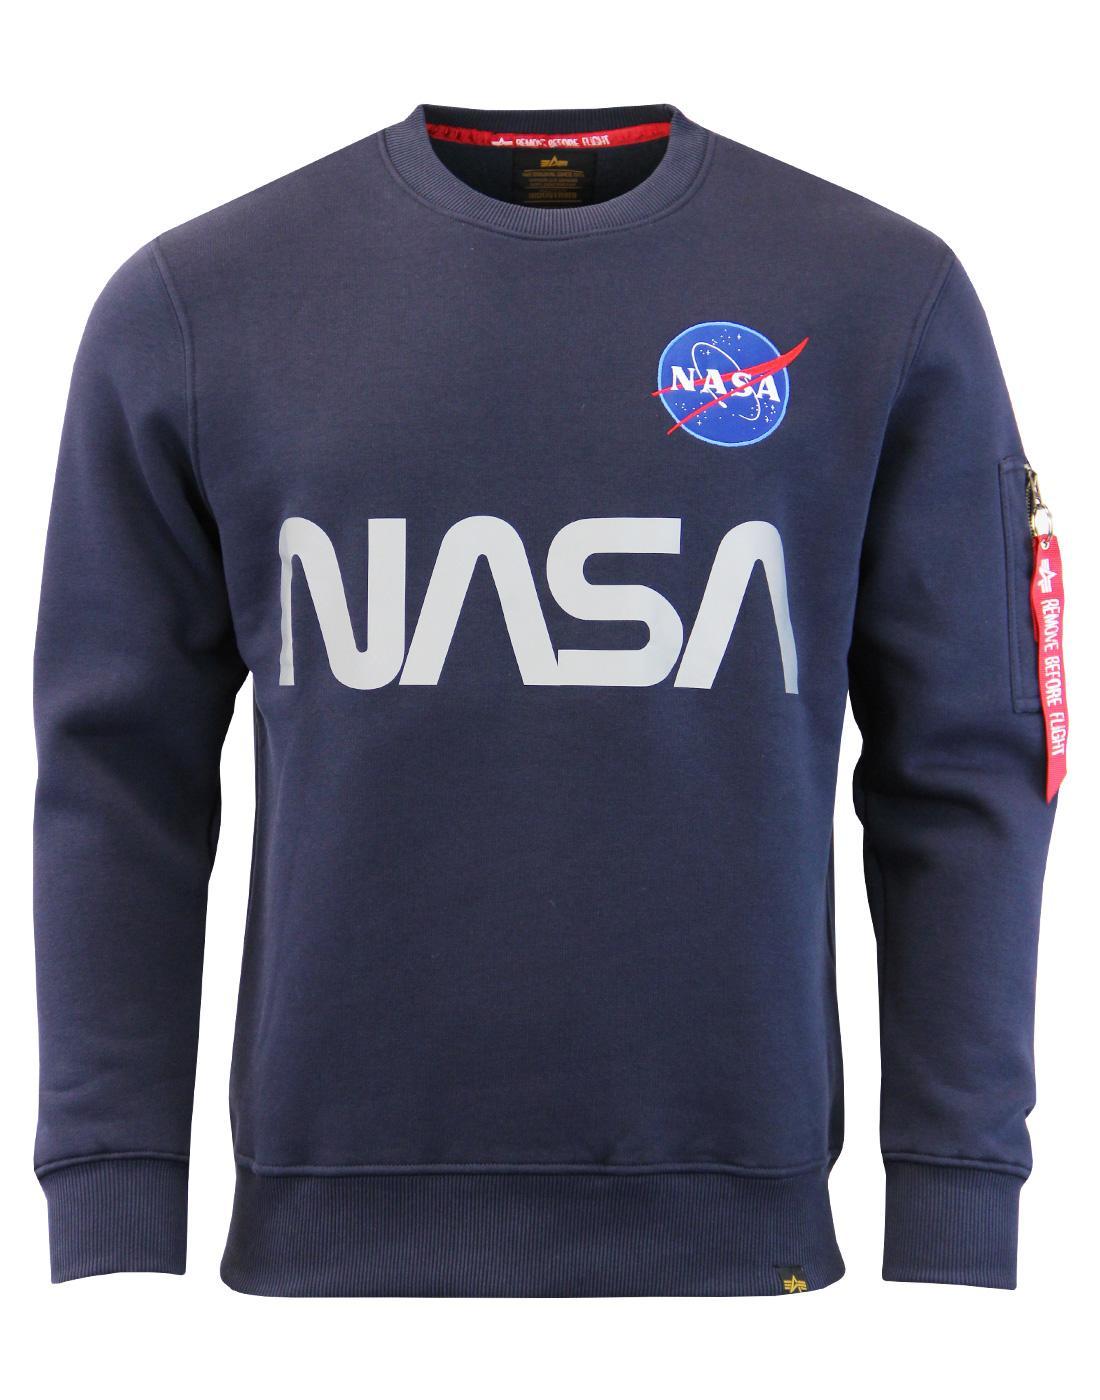 ALPHA INDUSTRIES NASA Reflective Retro Sweatshirt